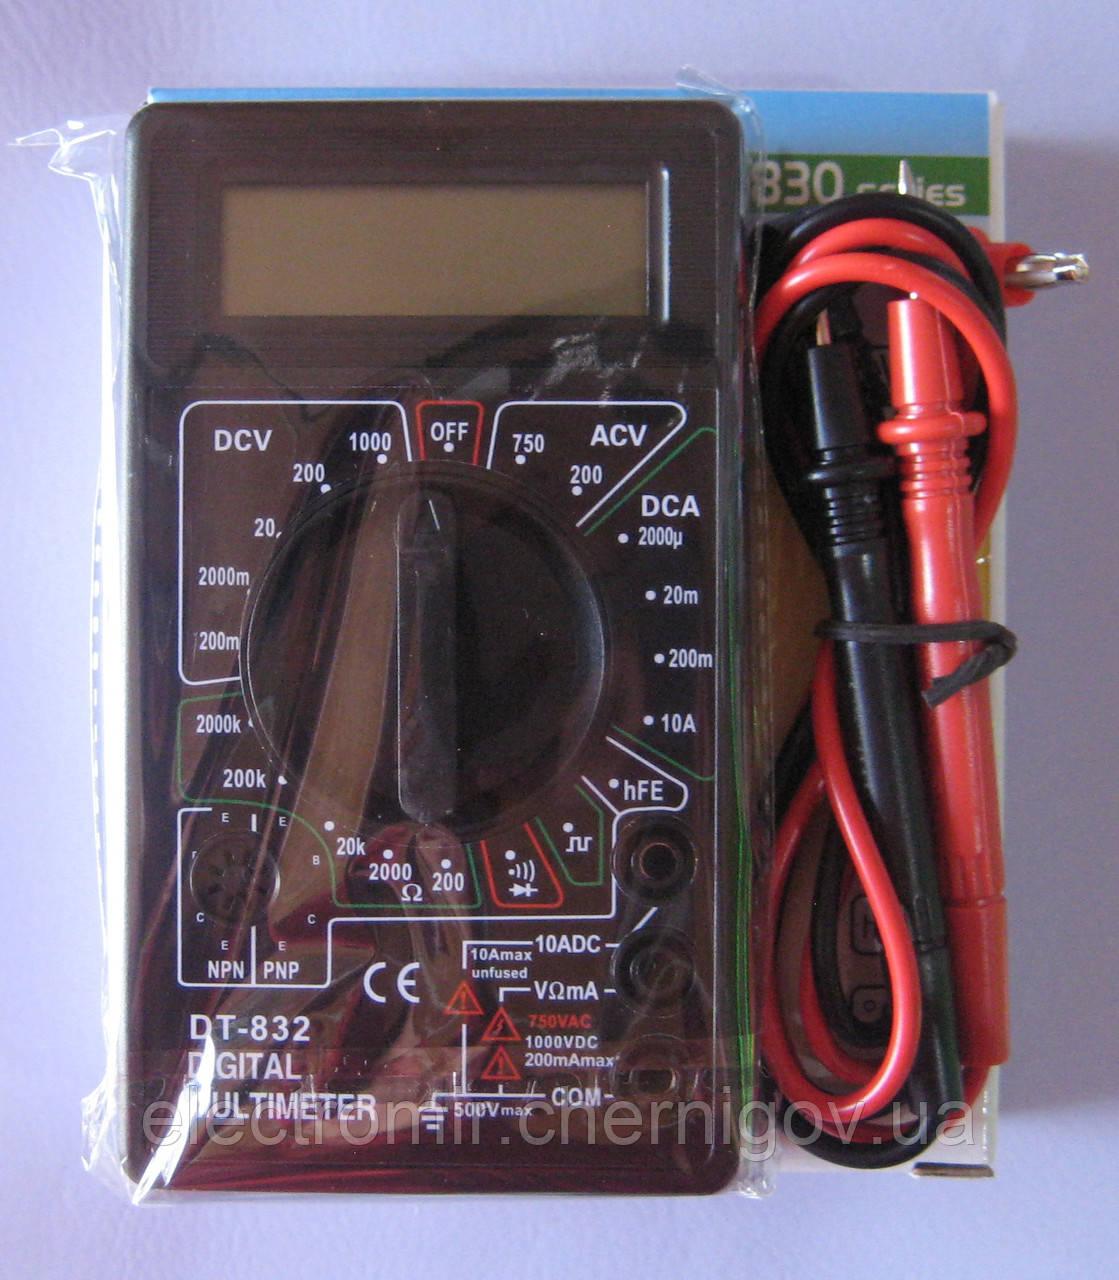 Мультиметр DT-832 со звуком